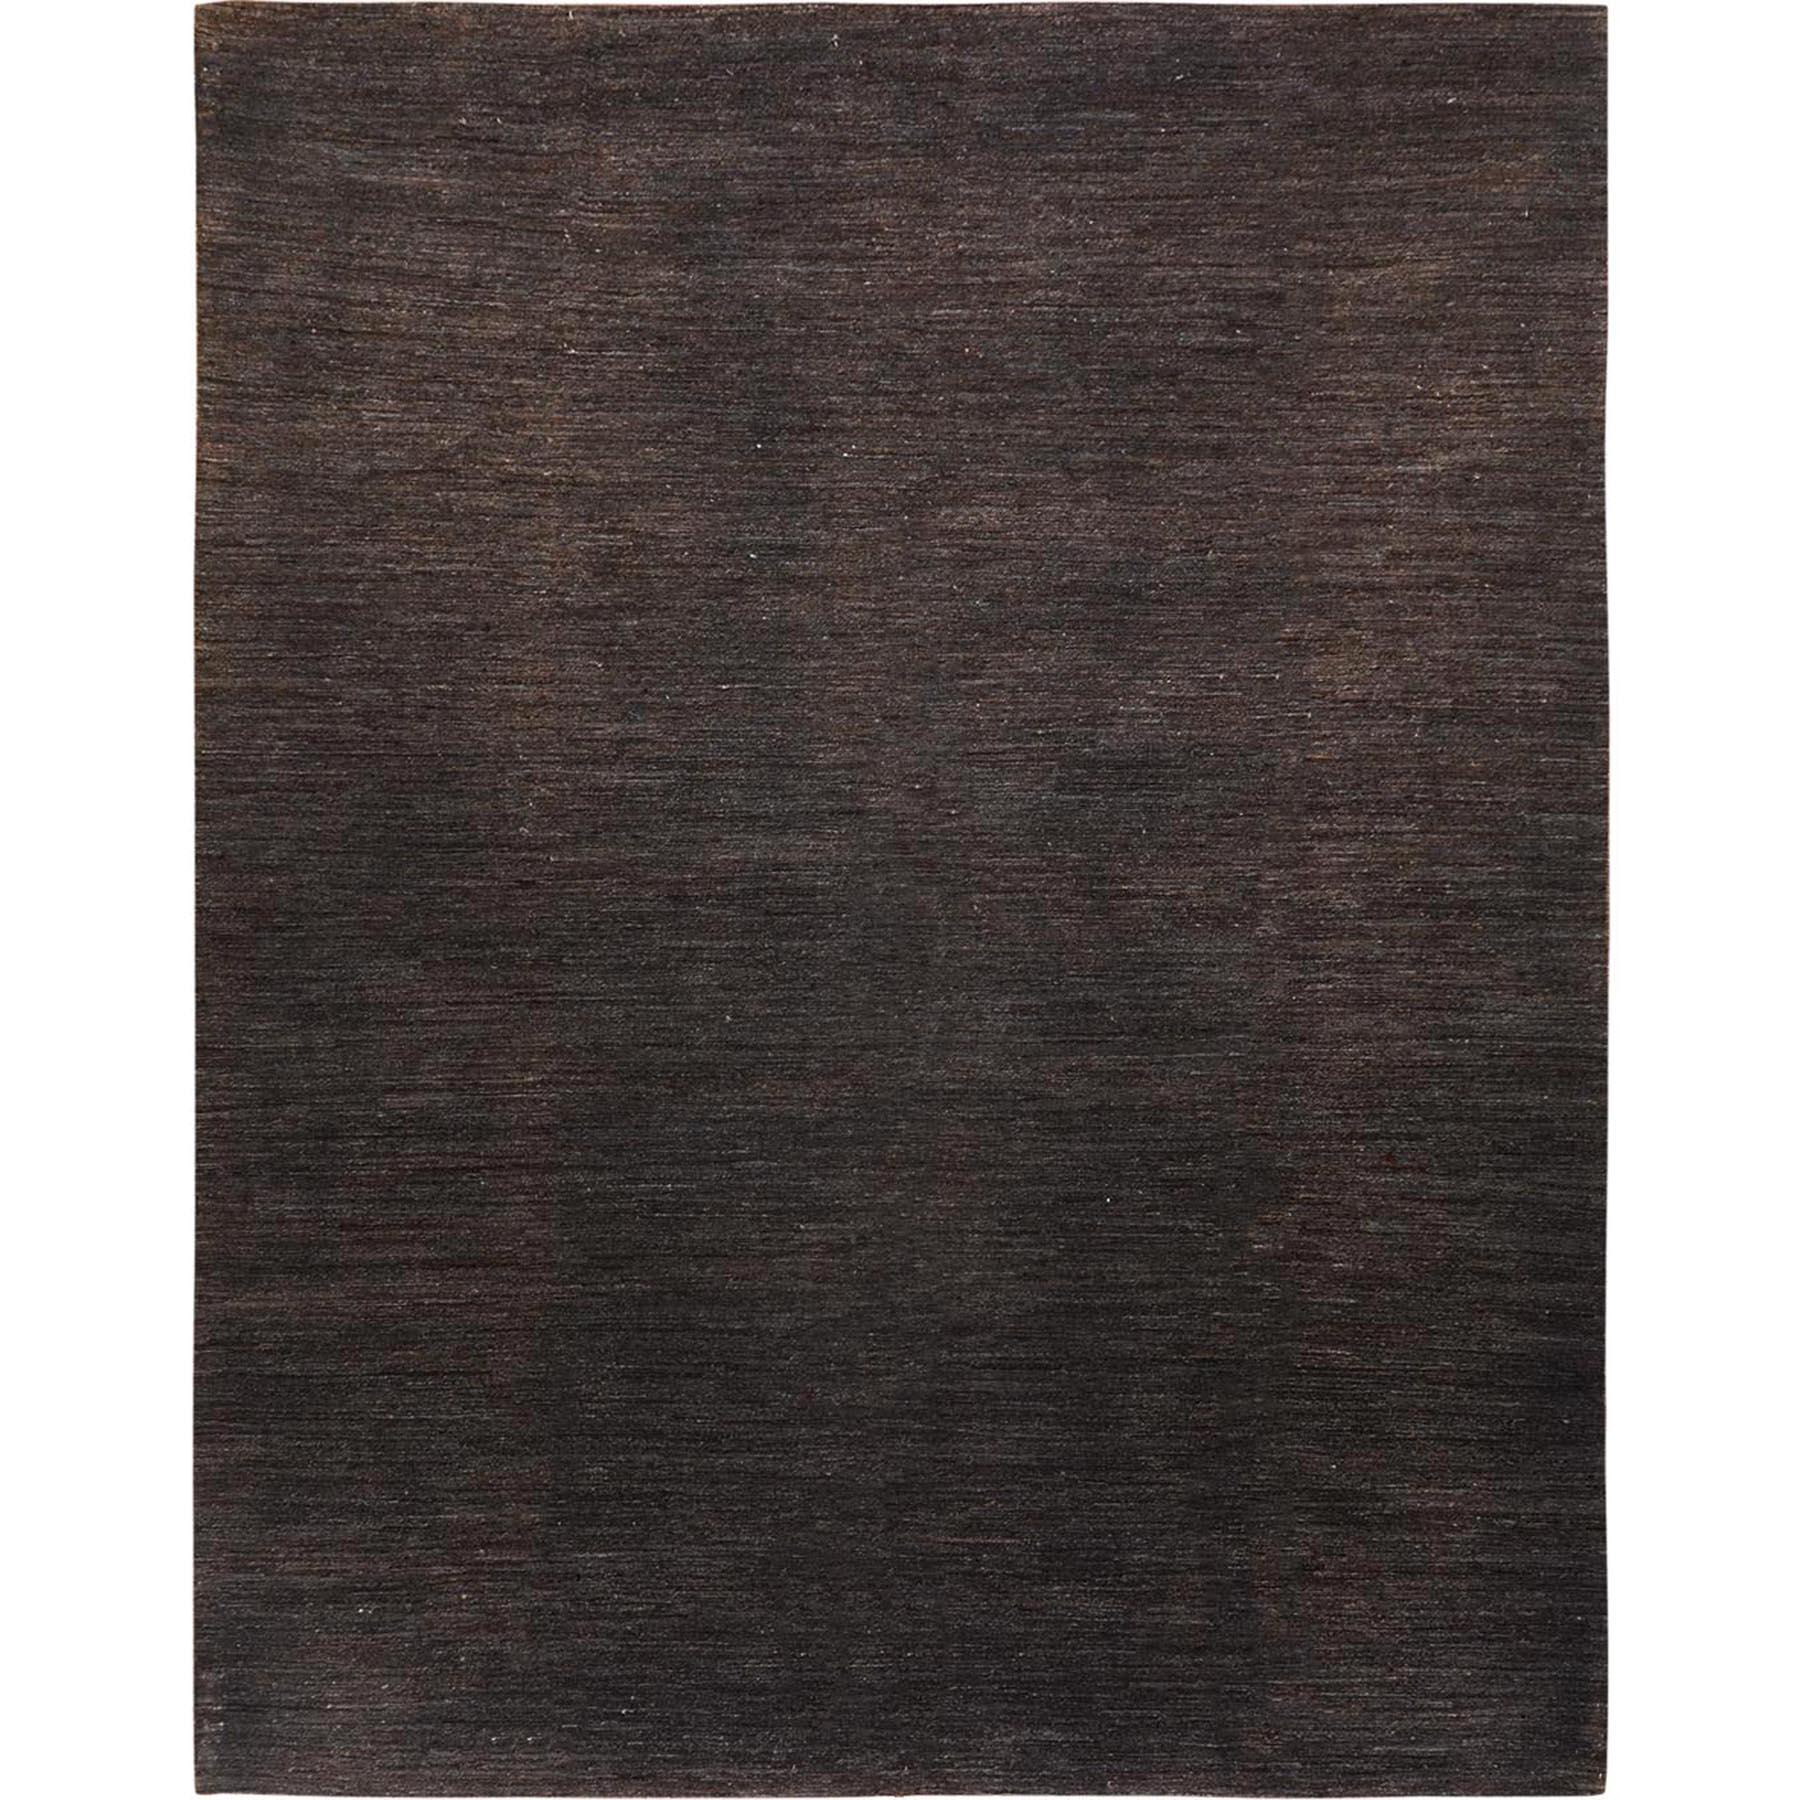 Fine Kilim Collection Hand Woven Brown Rug No: 01115038